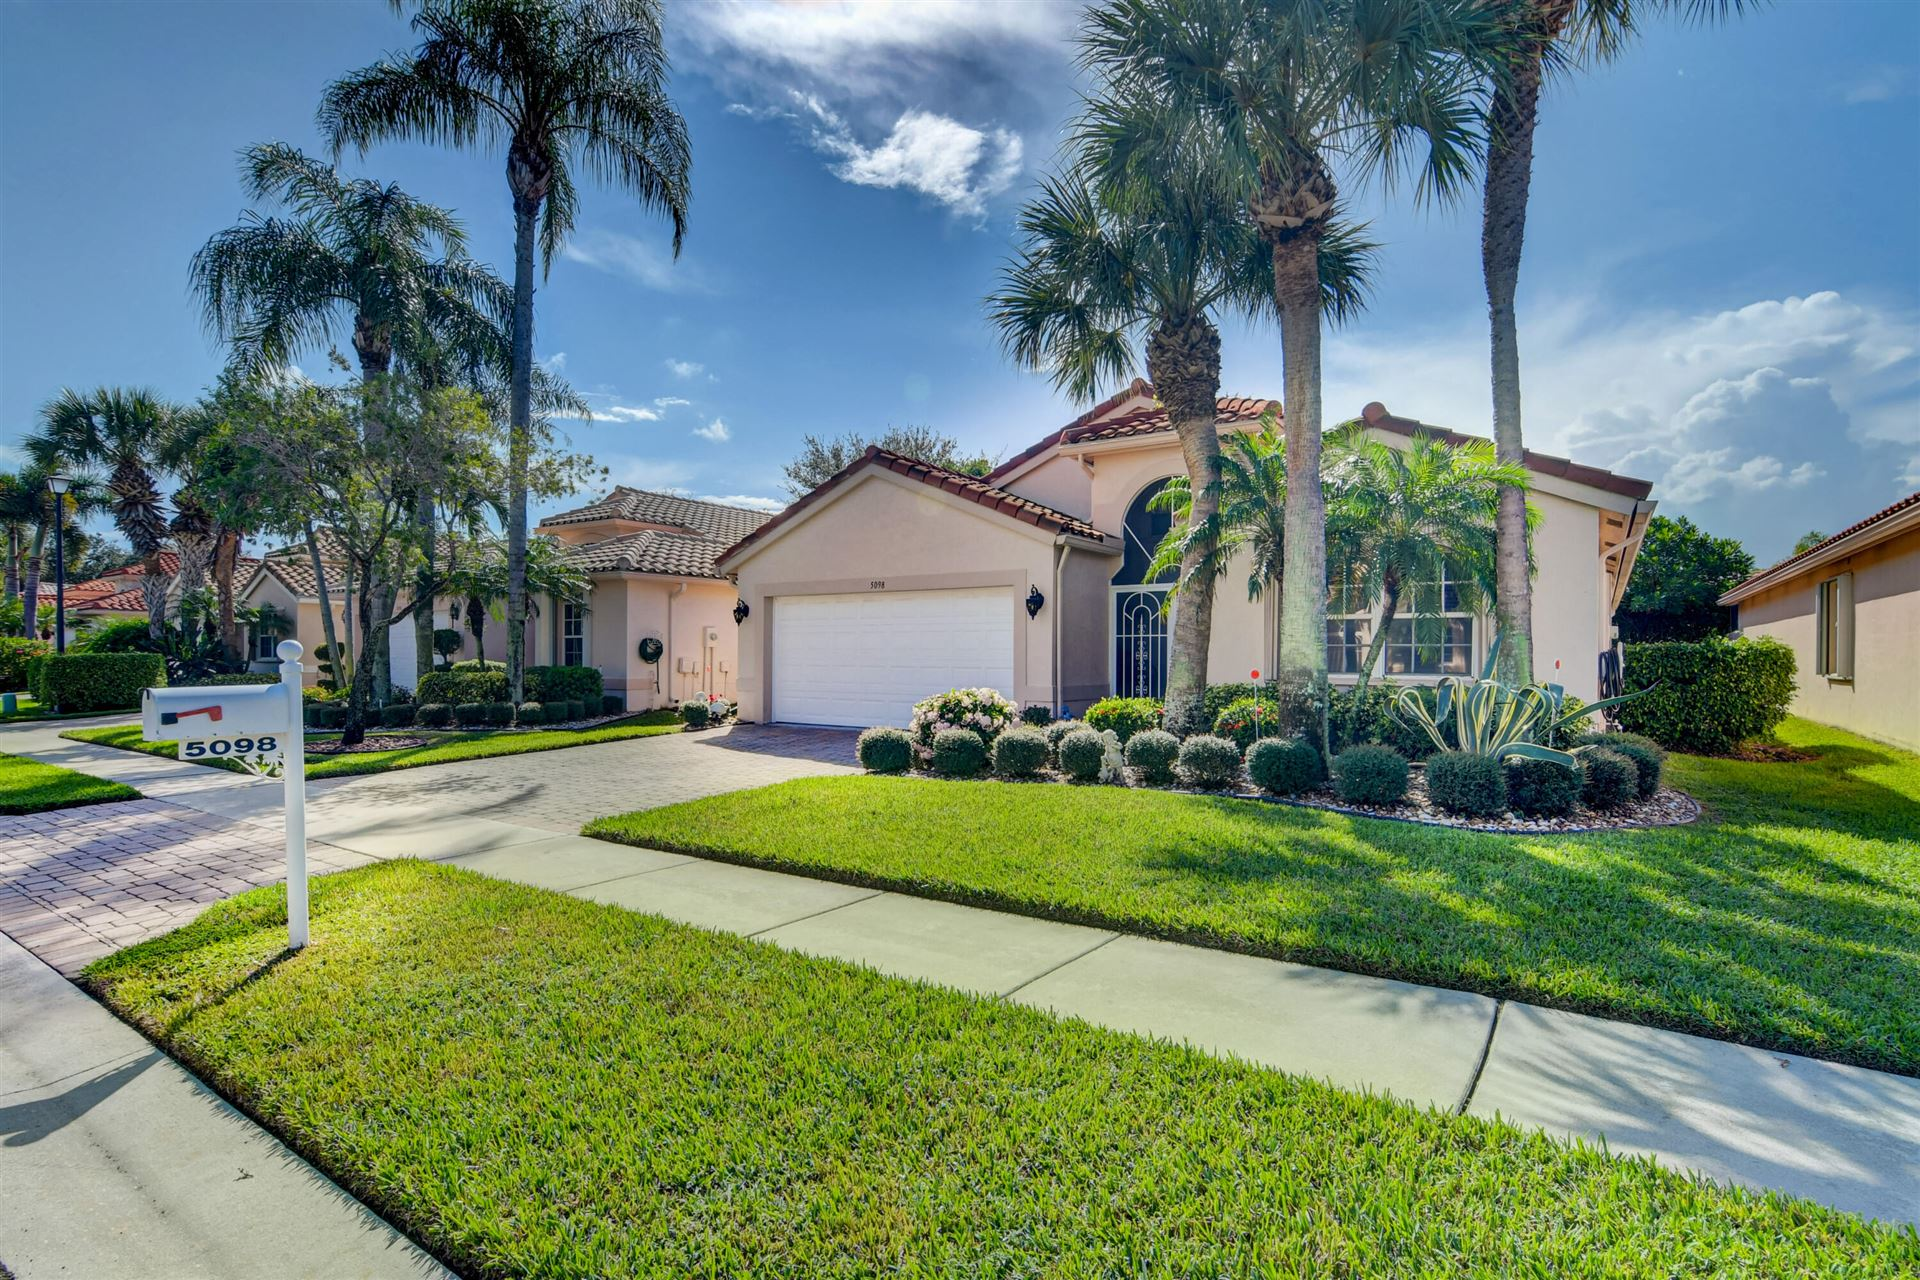 5098 Polly Park, Boynton Beach, FL 33437 - #: RX-10751499